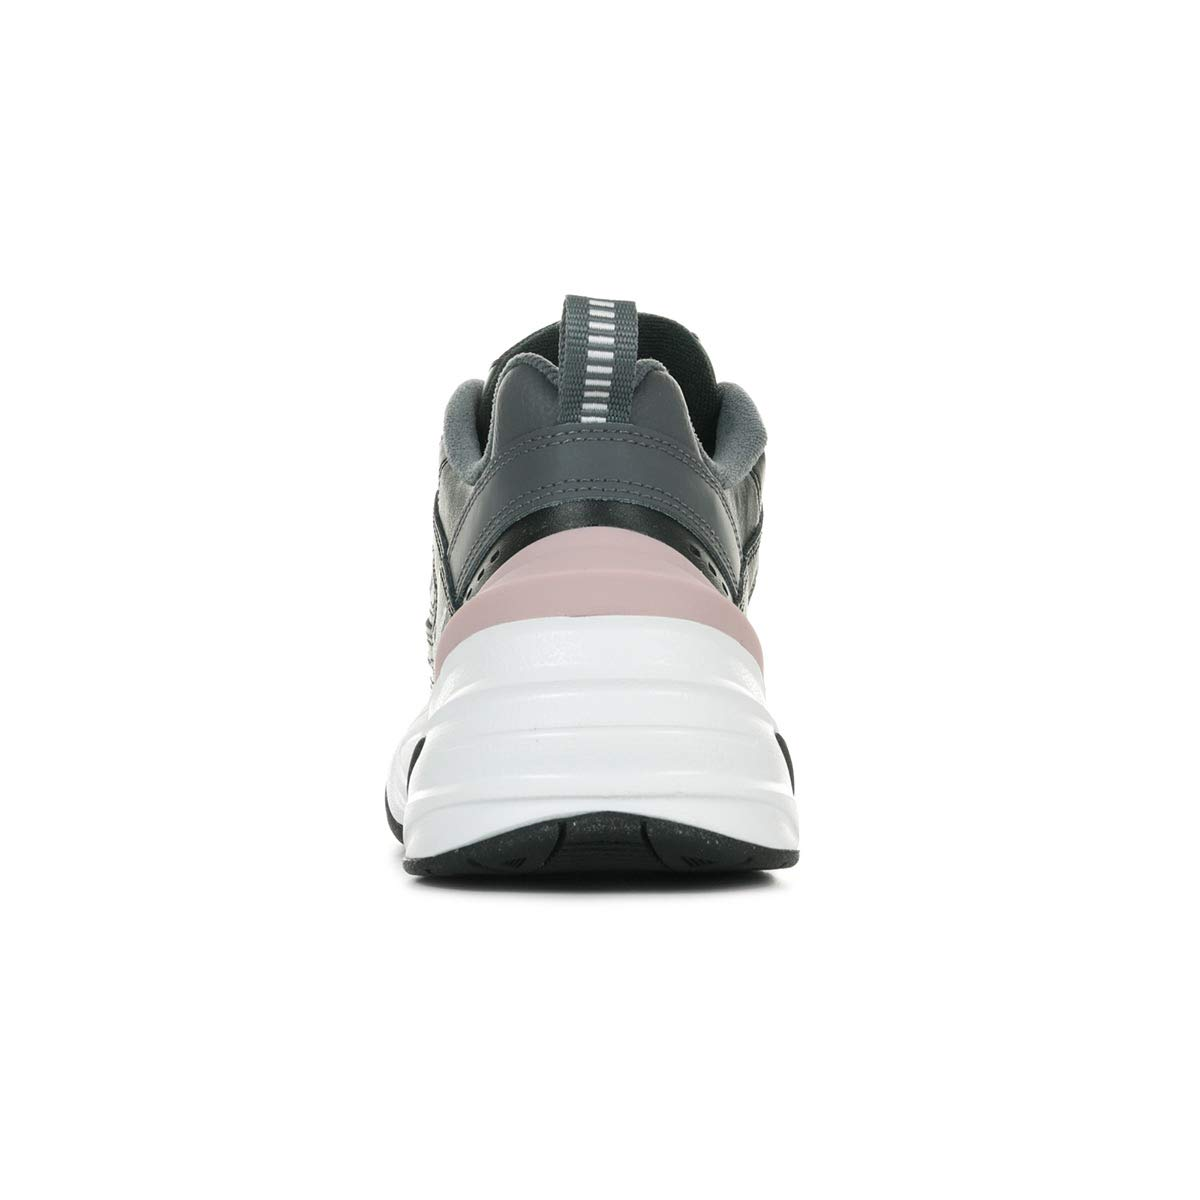 Nike Damen W M2k Tekno Leichtathletikschuhe Leichtathletikschuhe Leichtathletikschuhe  d00e40